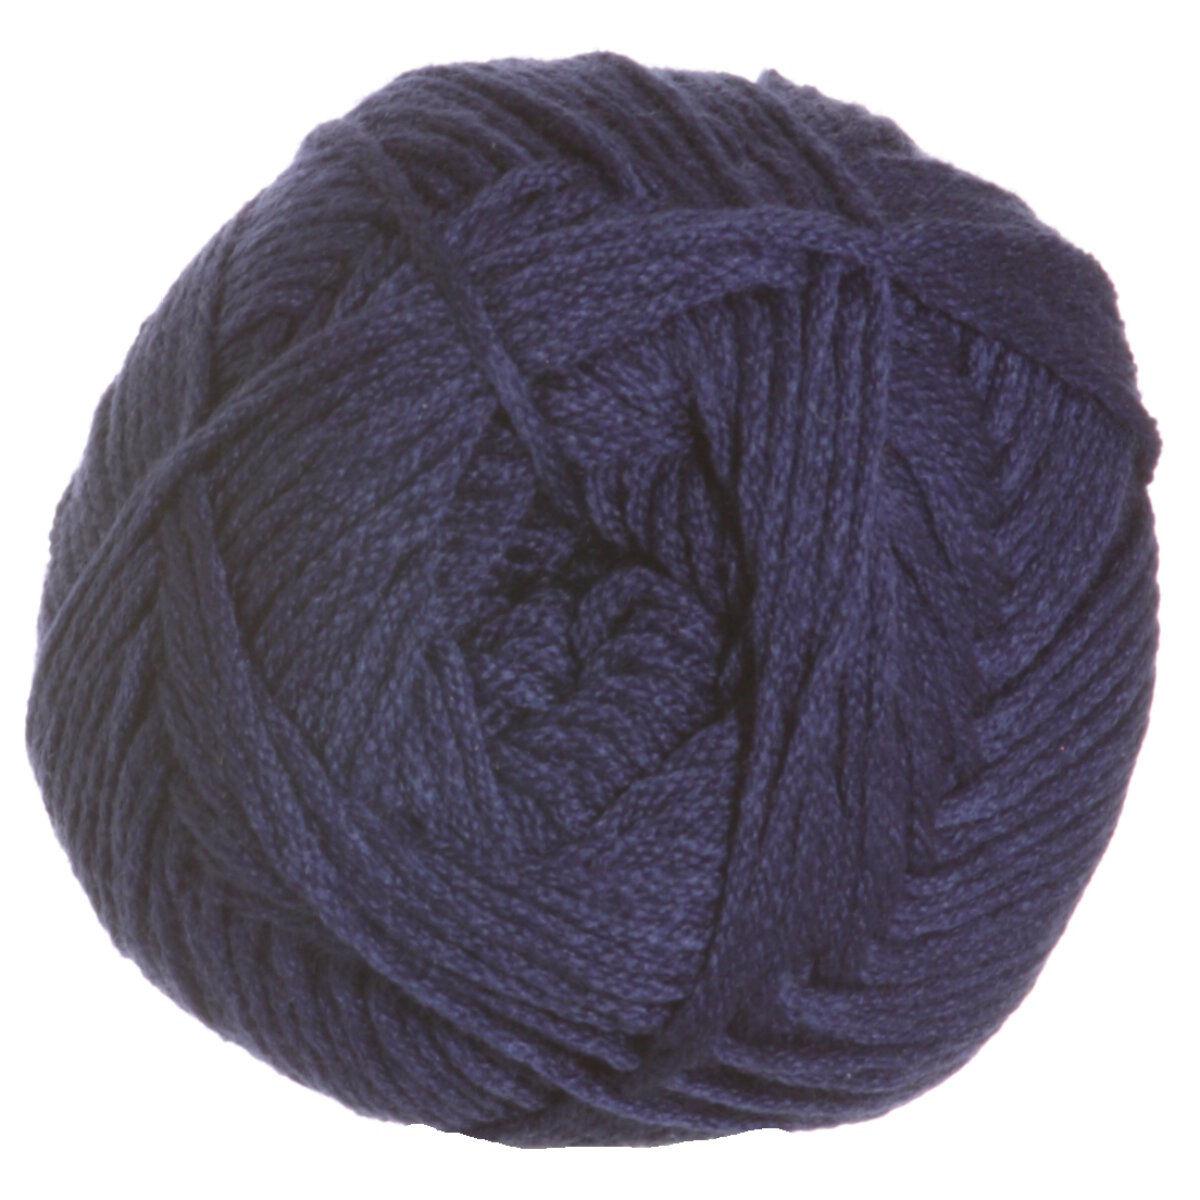 Berroco Comfort Dk Yarn 2763 Navy Blue Reviews At Jimmy